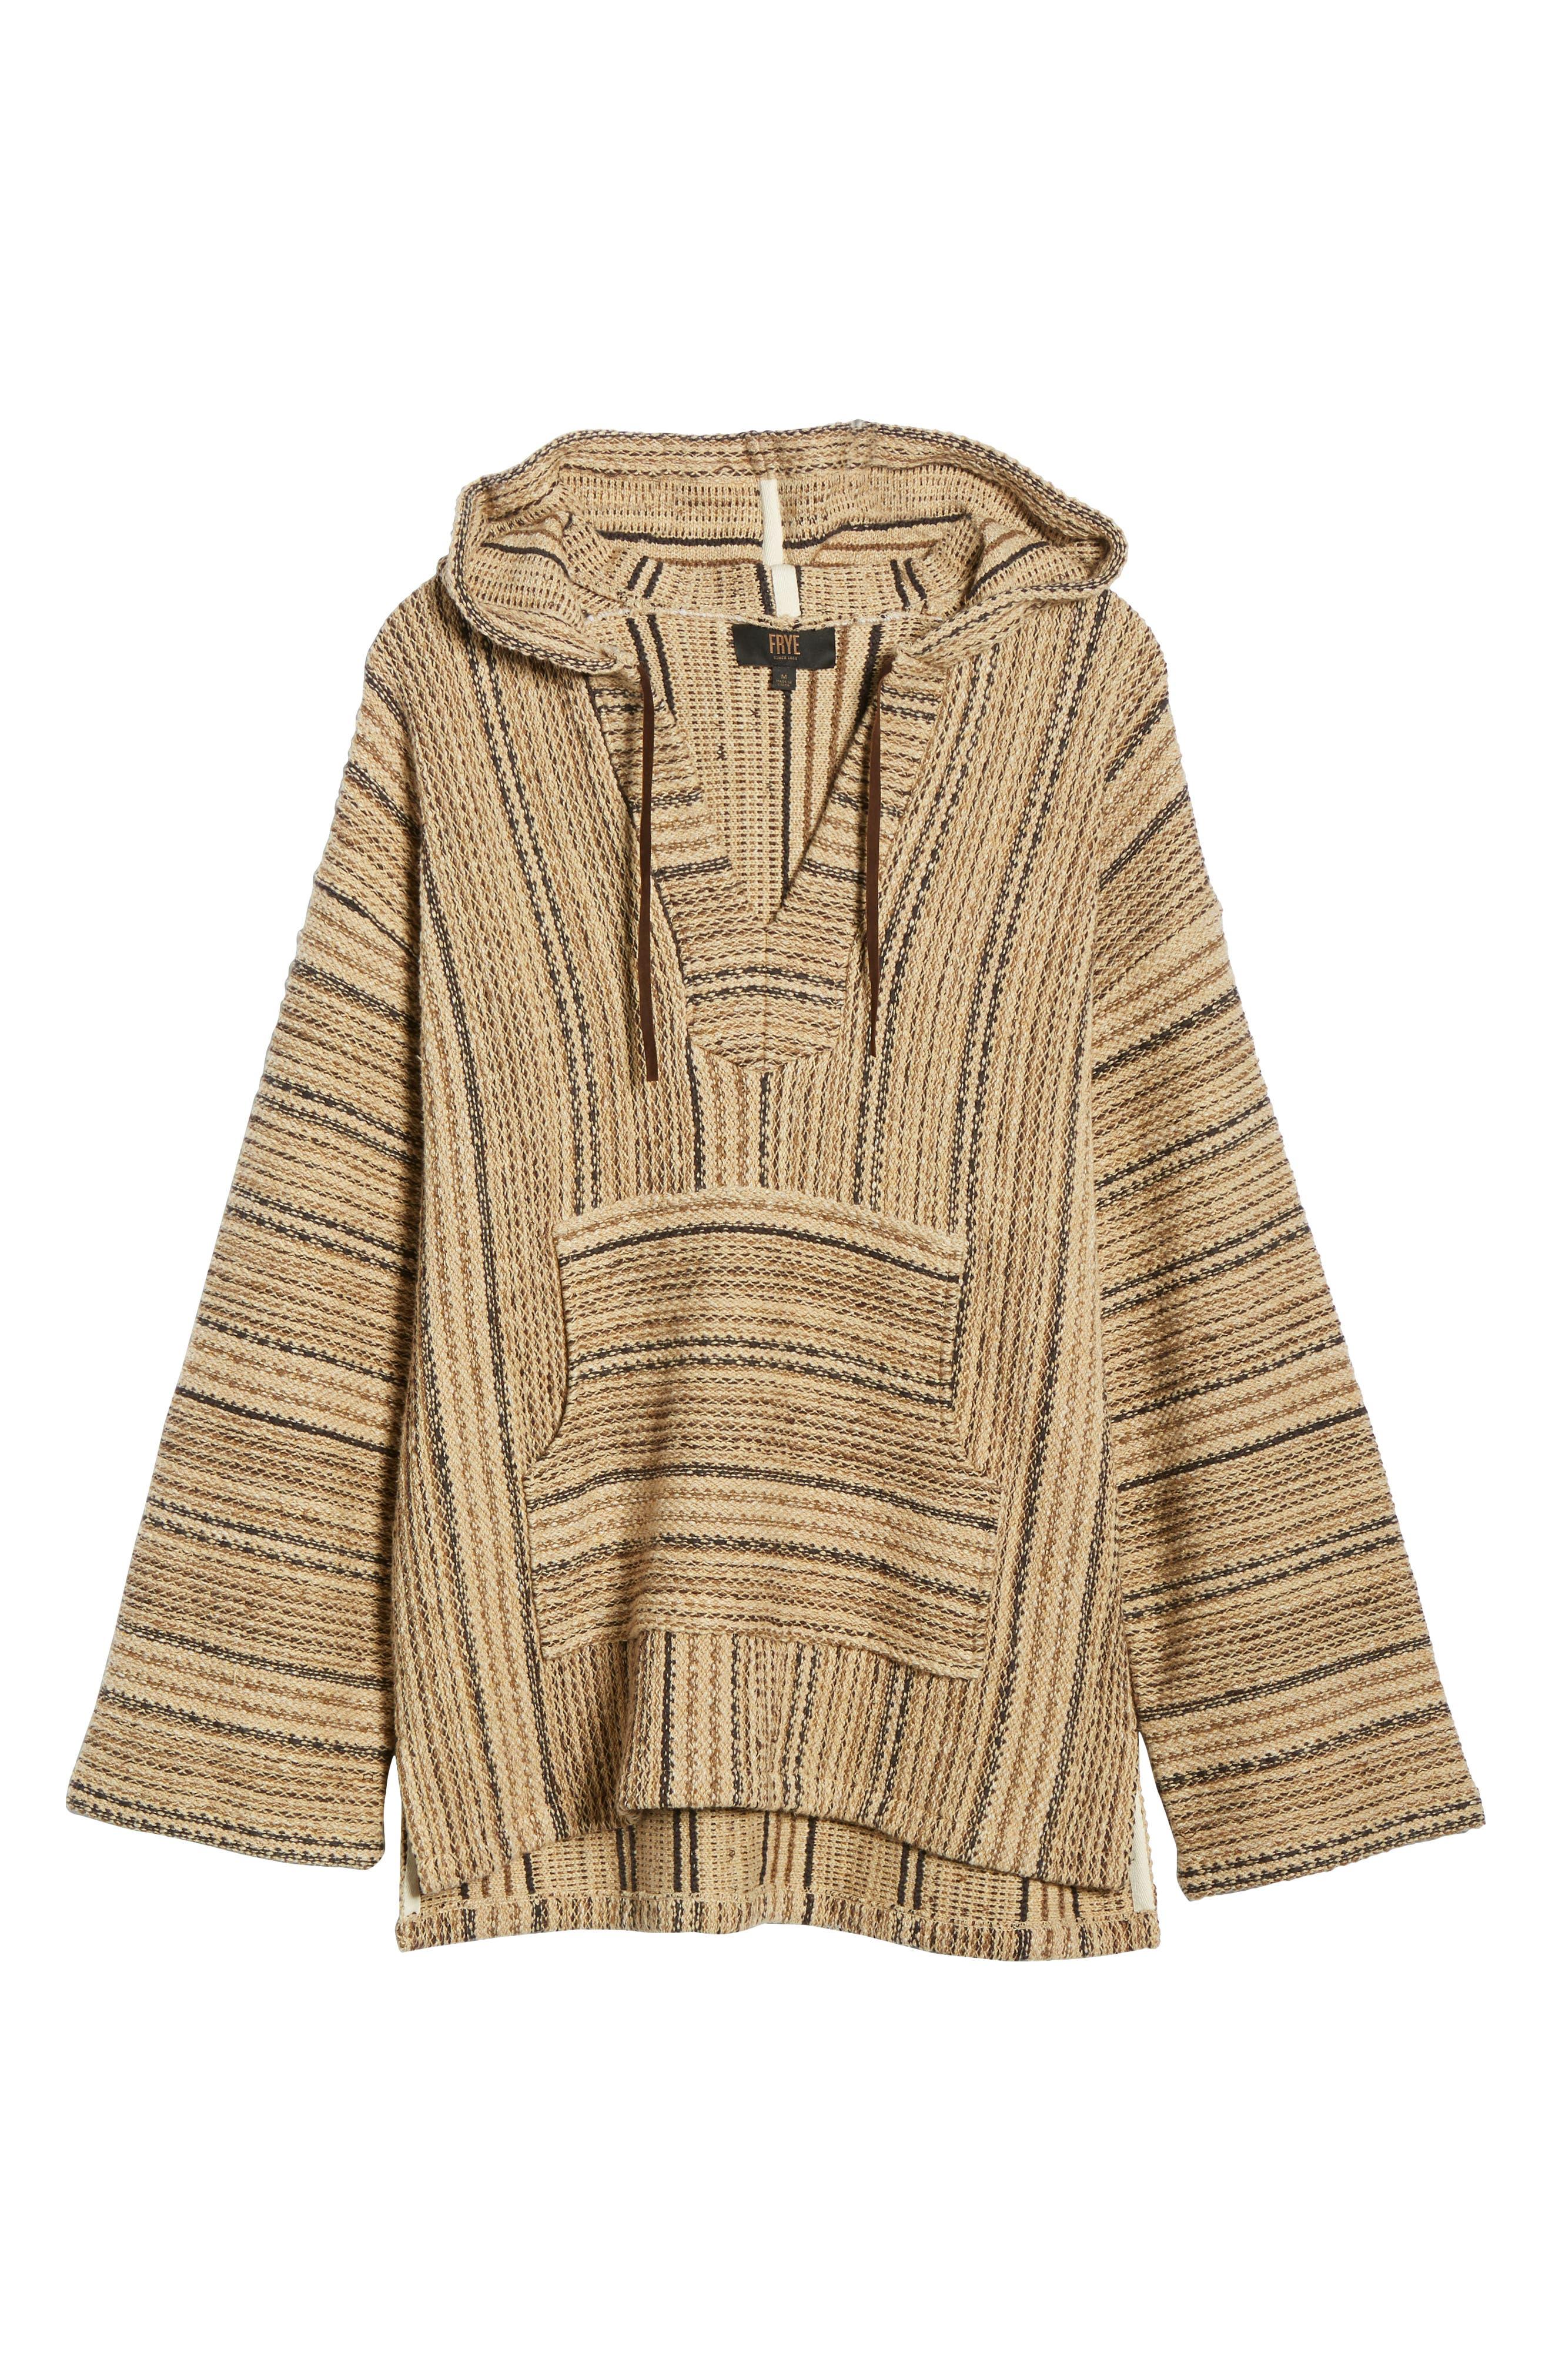 FRYE, Baja Hooded Pullover, Alternate thumbnail 6, color, TAOS TAUPE STRIPE